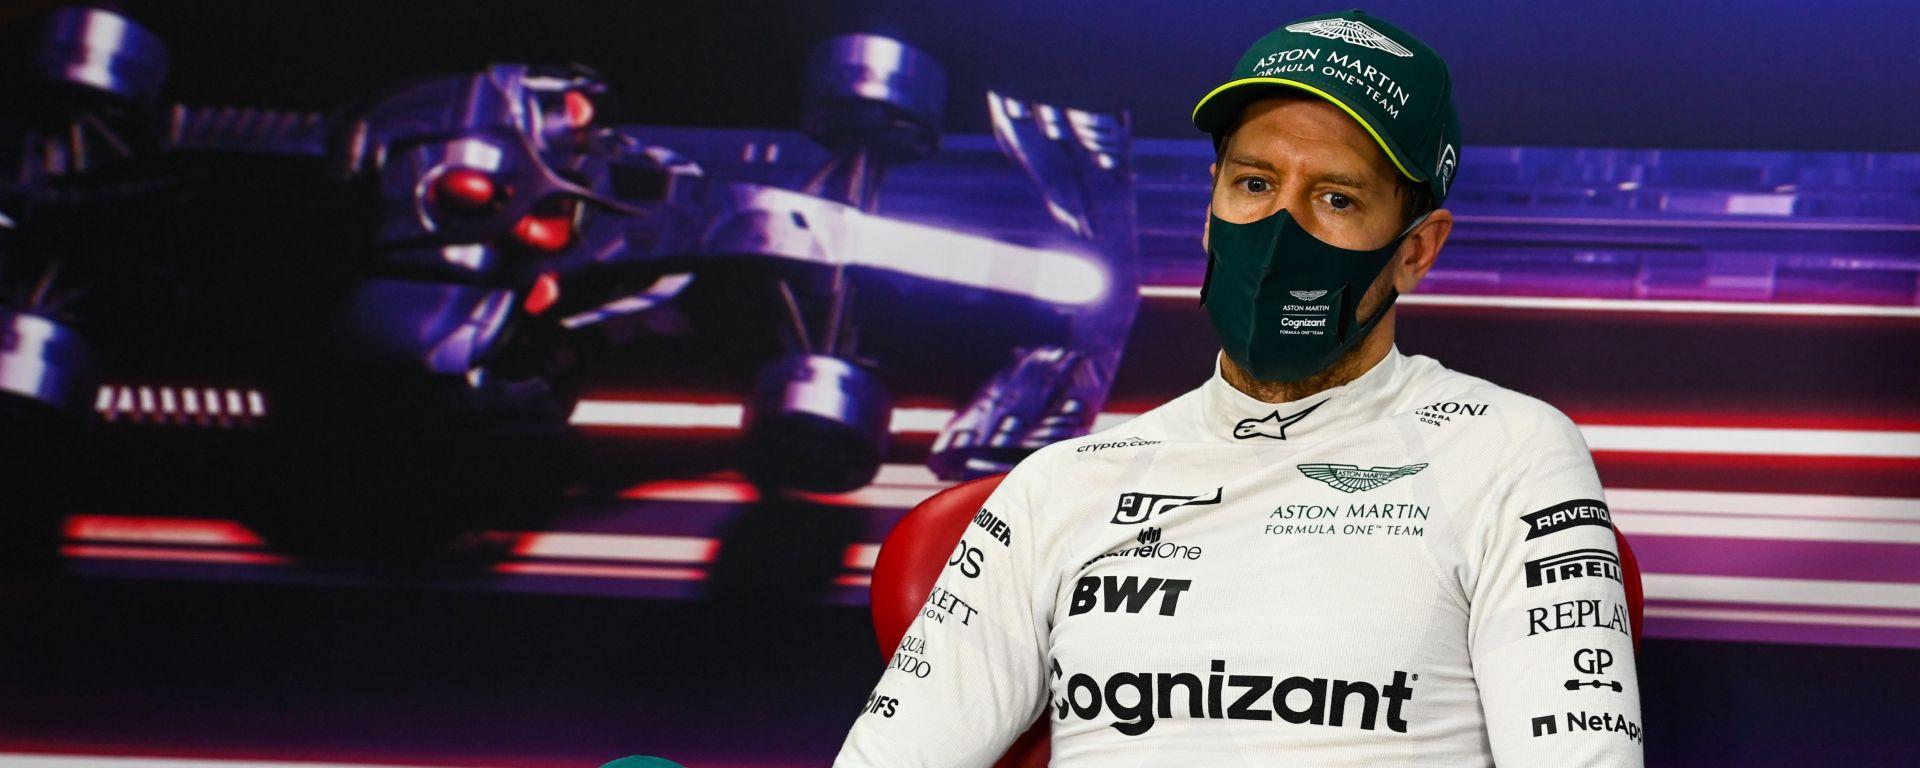 Test F1 2021: Sebastian Vettel (Aston Martin)